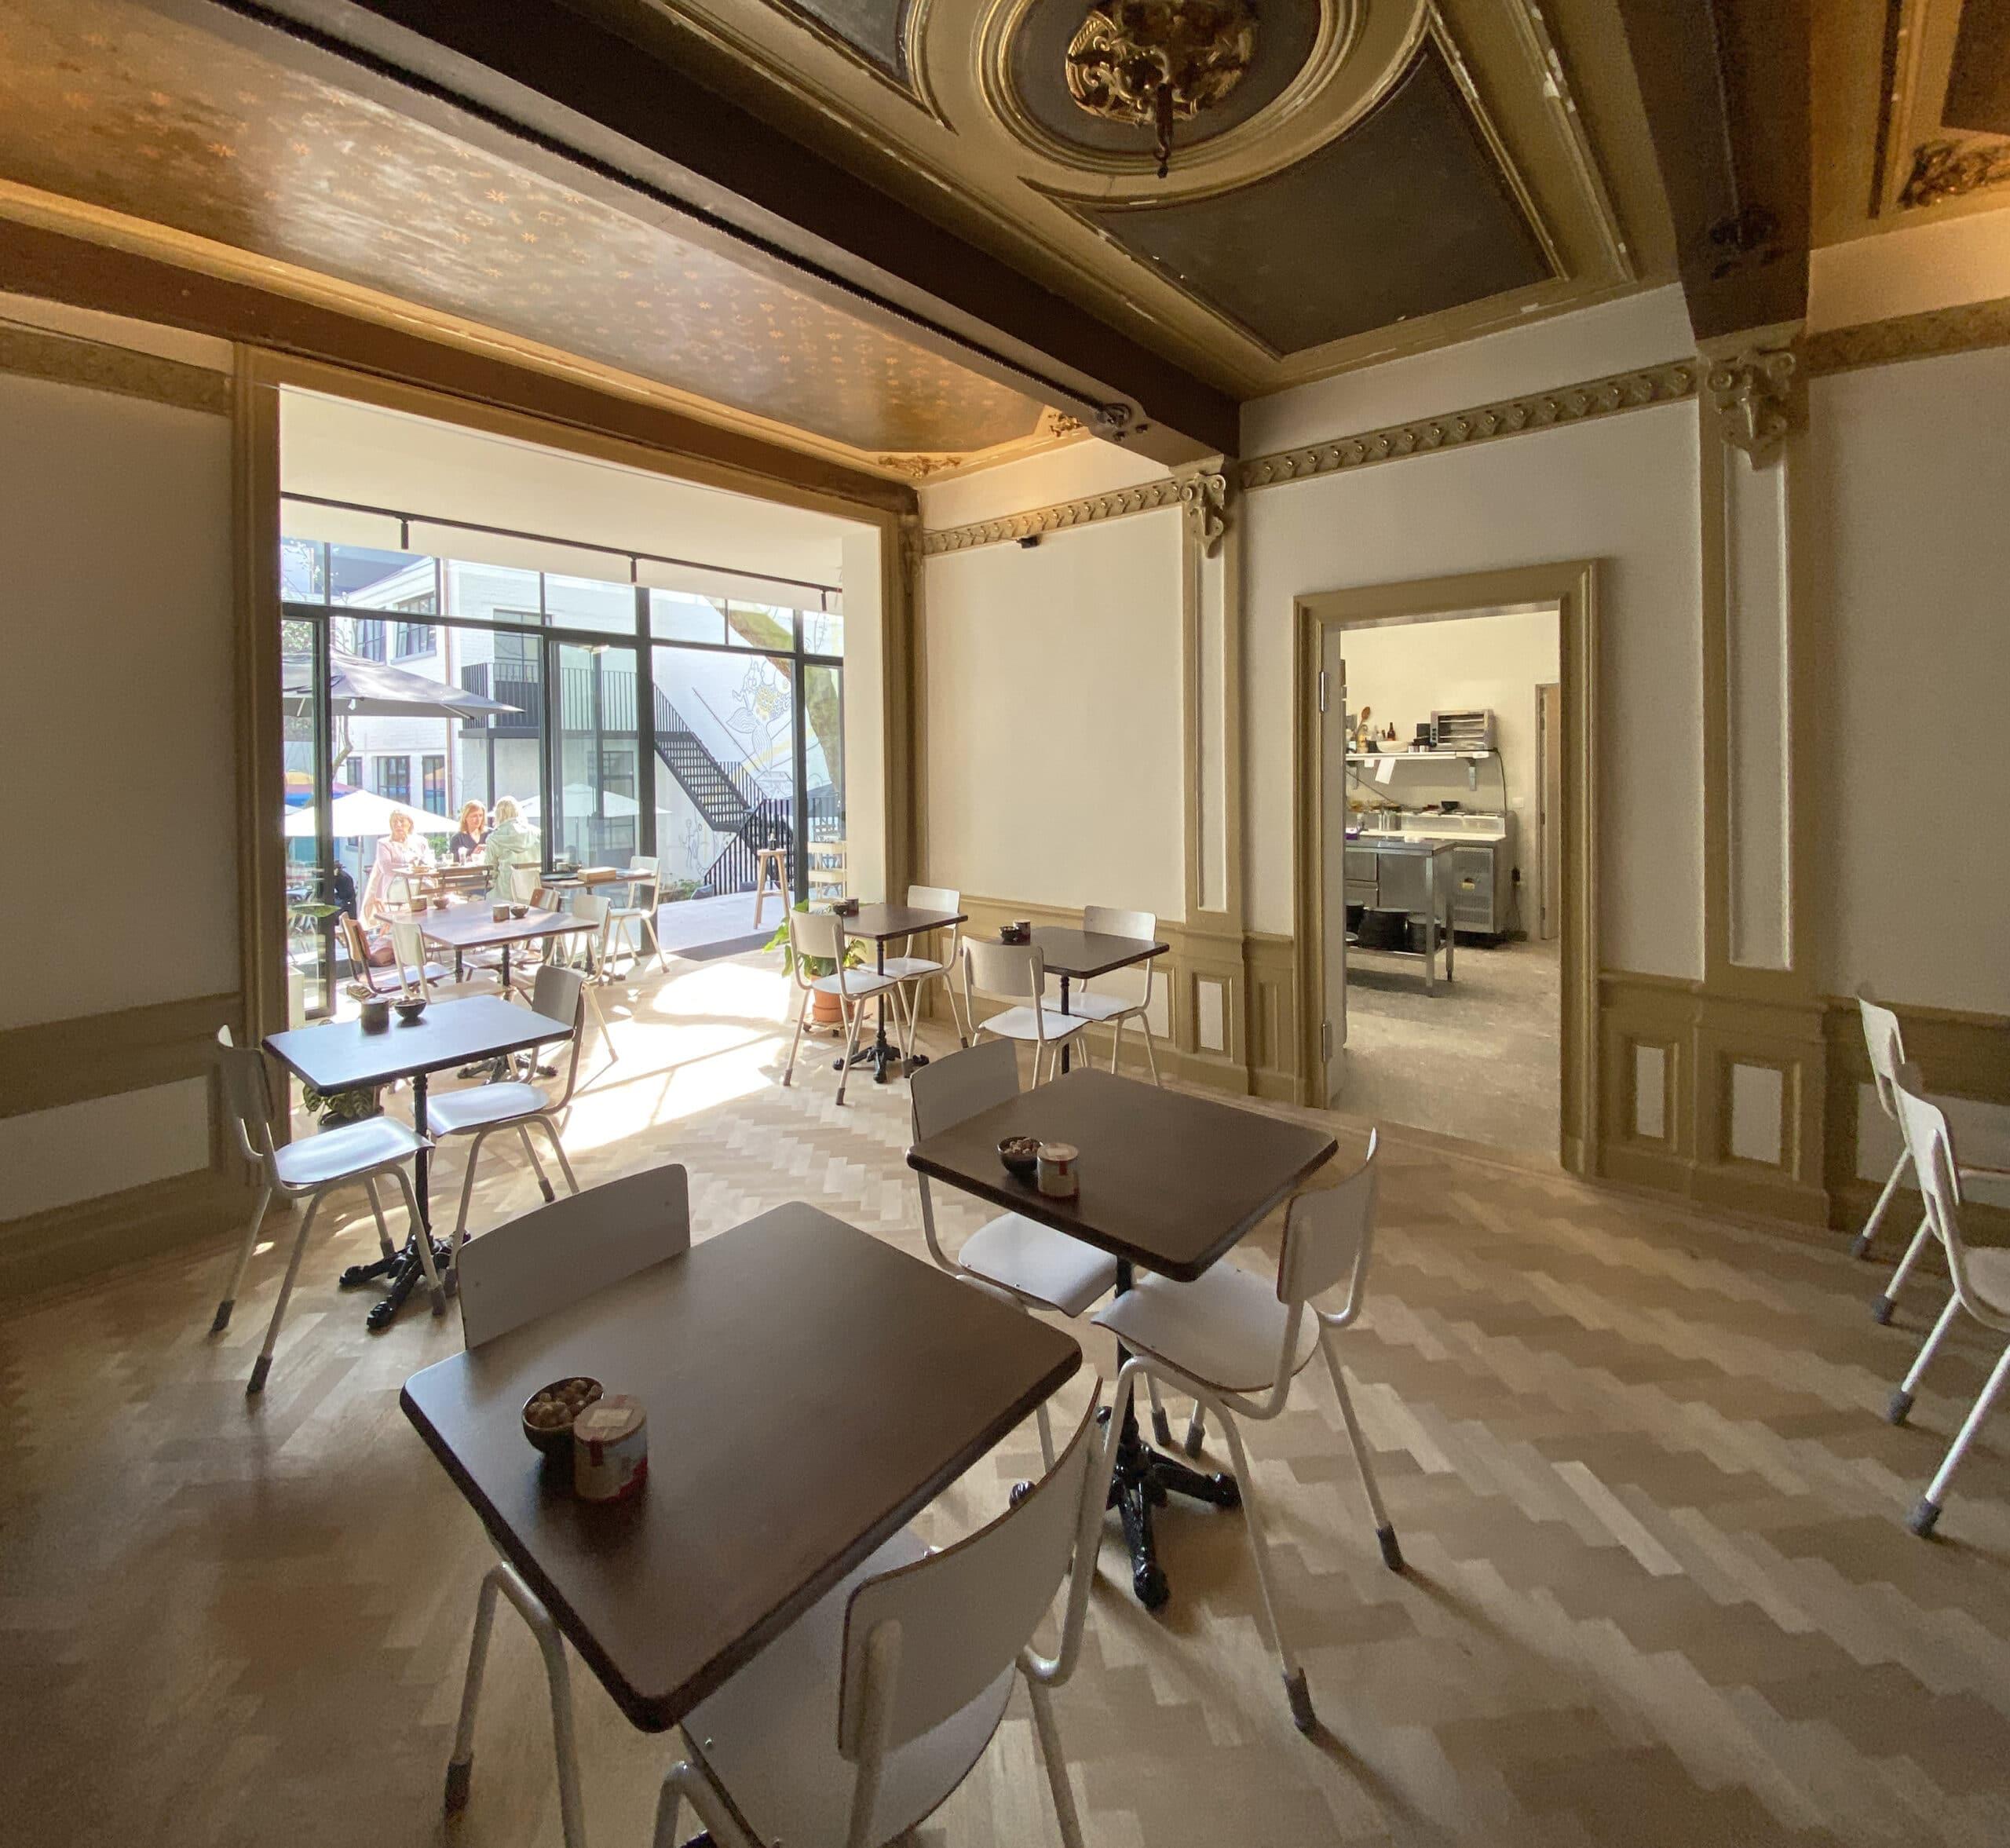 IMG 8160 2 scaled | Baeyens & Beck architecten Gent | architect nieuwbouw renovatie interieur | high end | architectenbureau